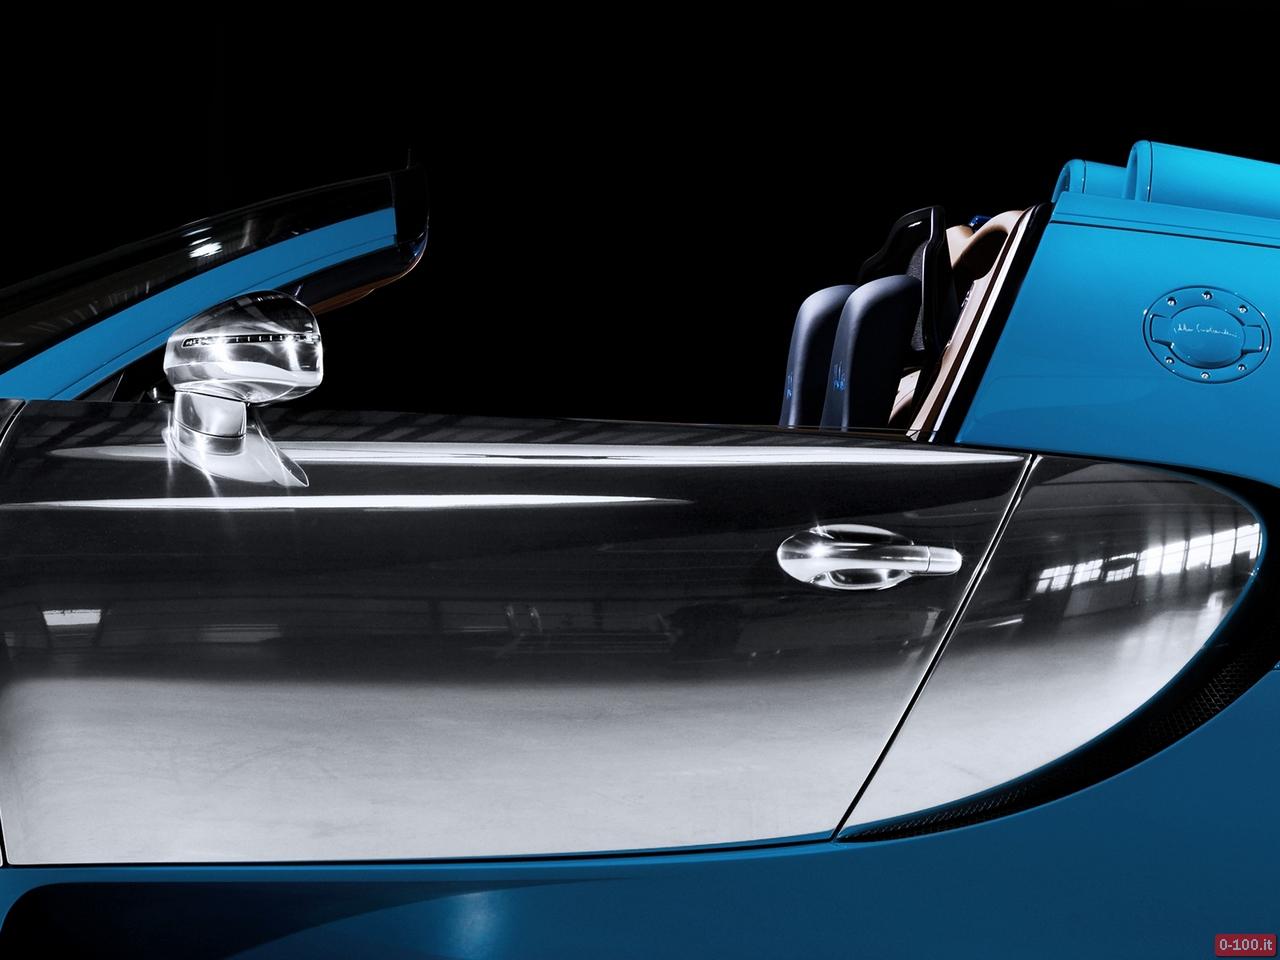 bugatti-veyron-grand-sport-vitesse-meo-costantini_0-100_20